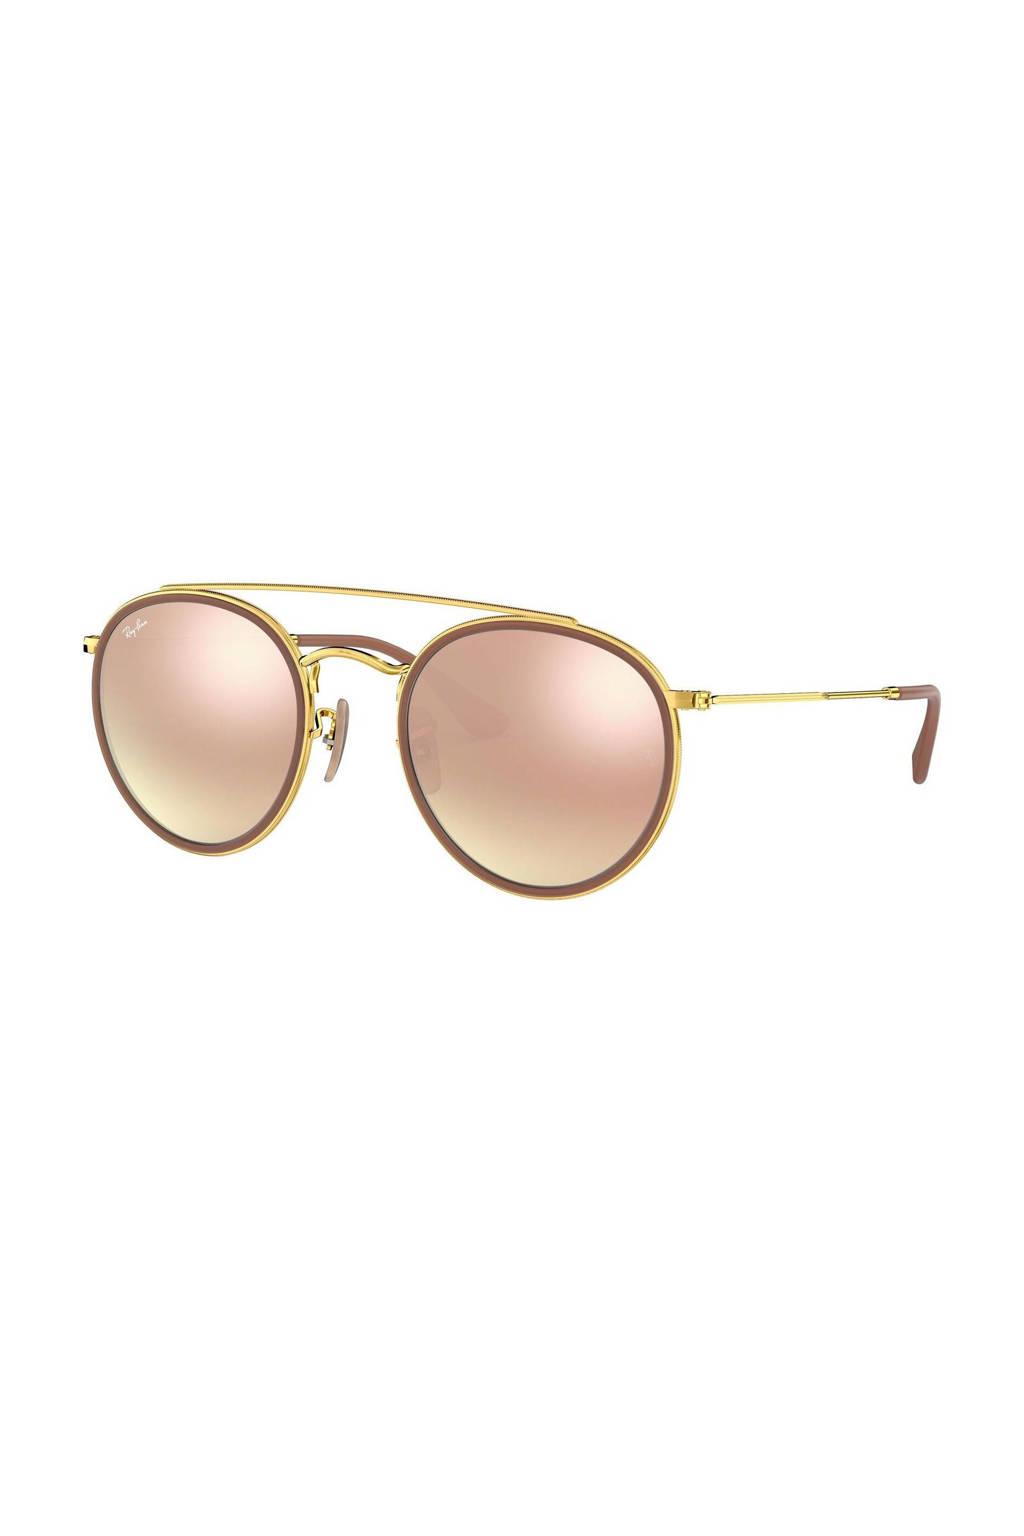 Ray-Ban zonnebril 0RB3647N goud/roze, Bruin/roze